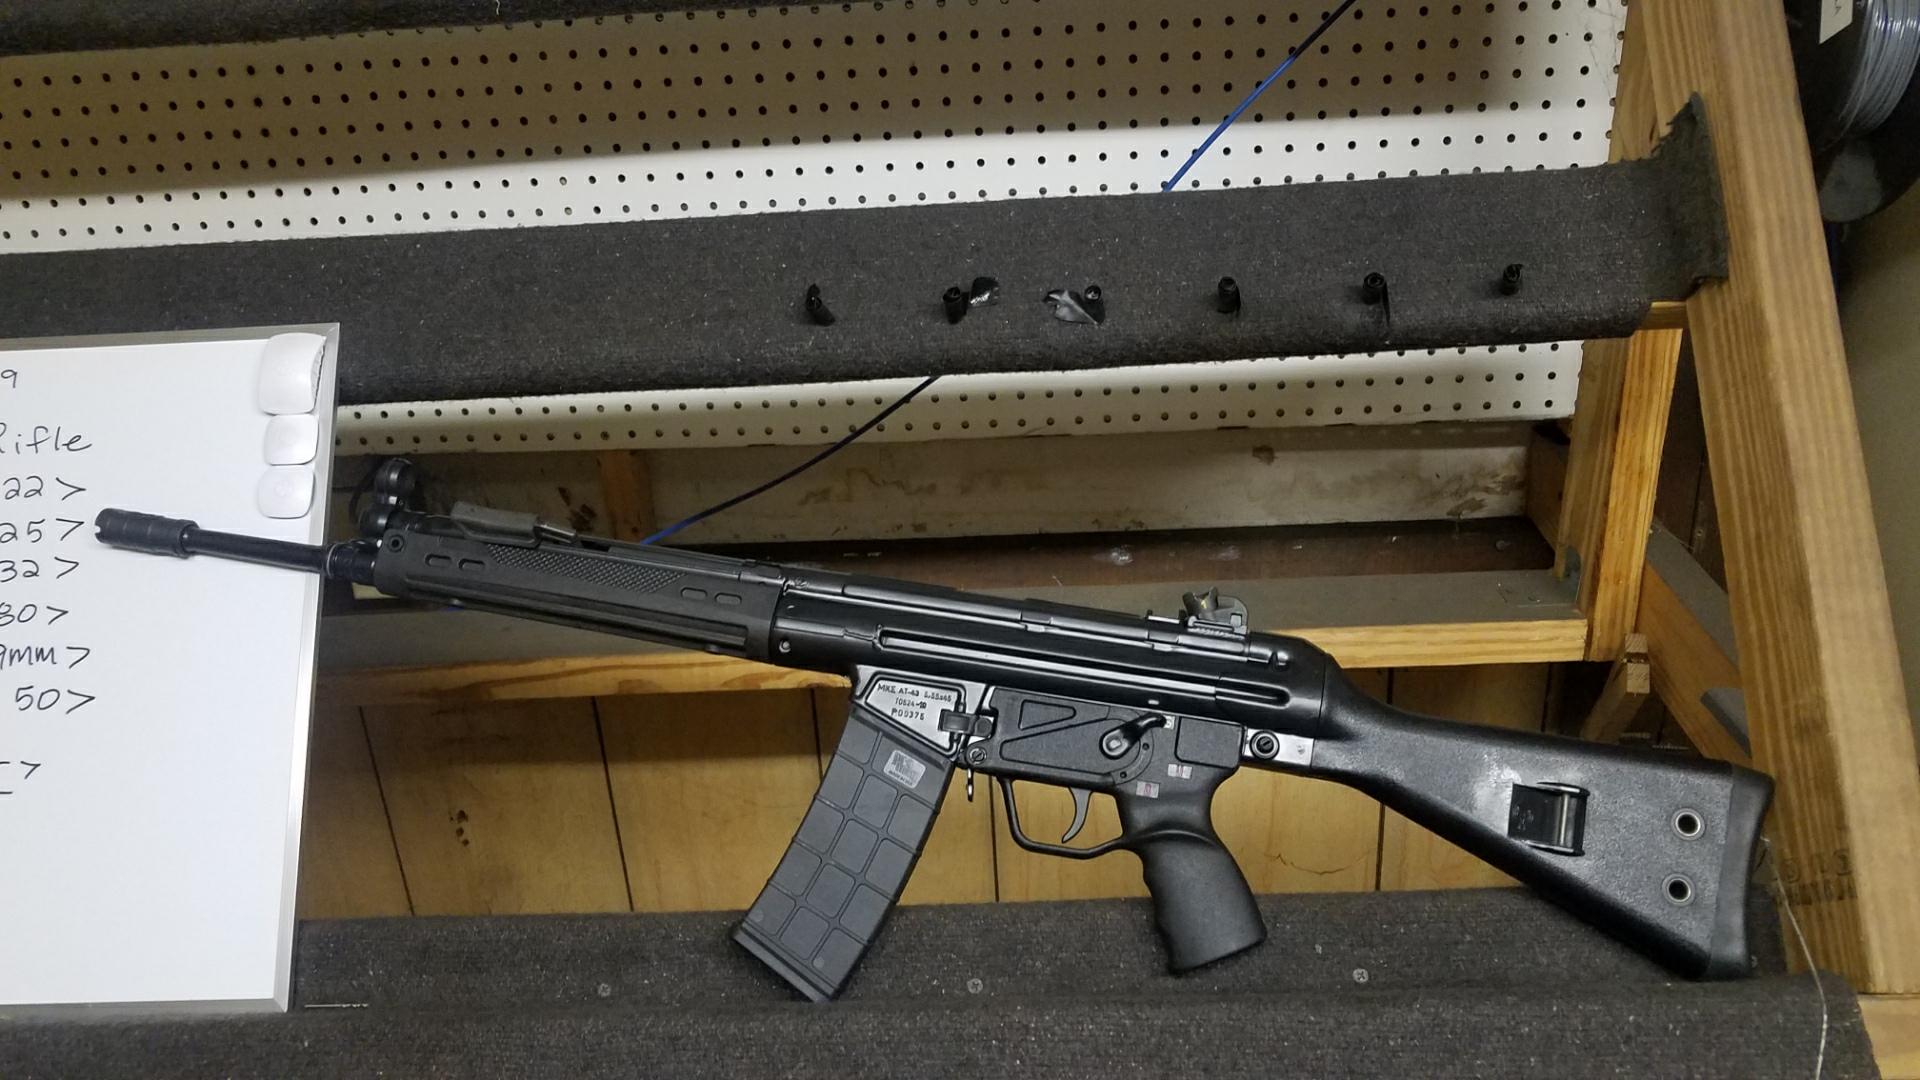 WTS: MKE43 carbine-3a701f9d-0986-4294-8dc3-11a7de384a53.jpeg